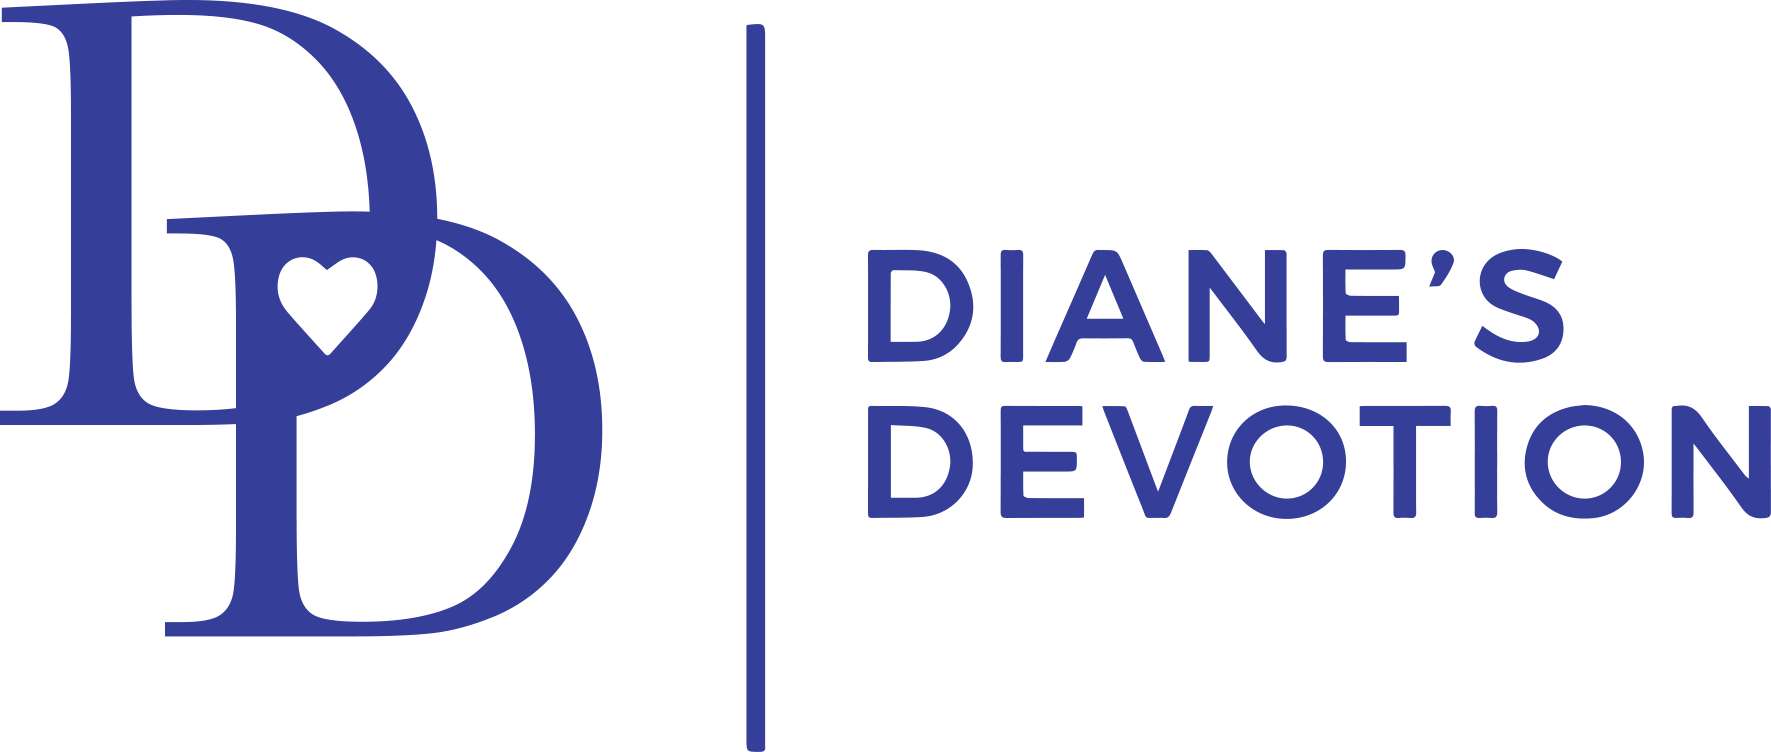 Dianes Devotion Logo